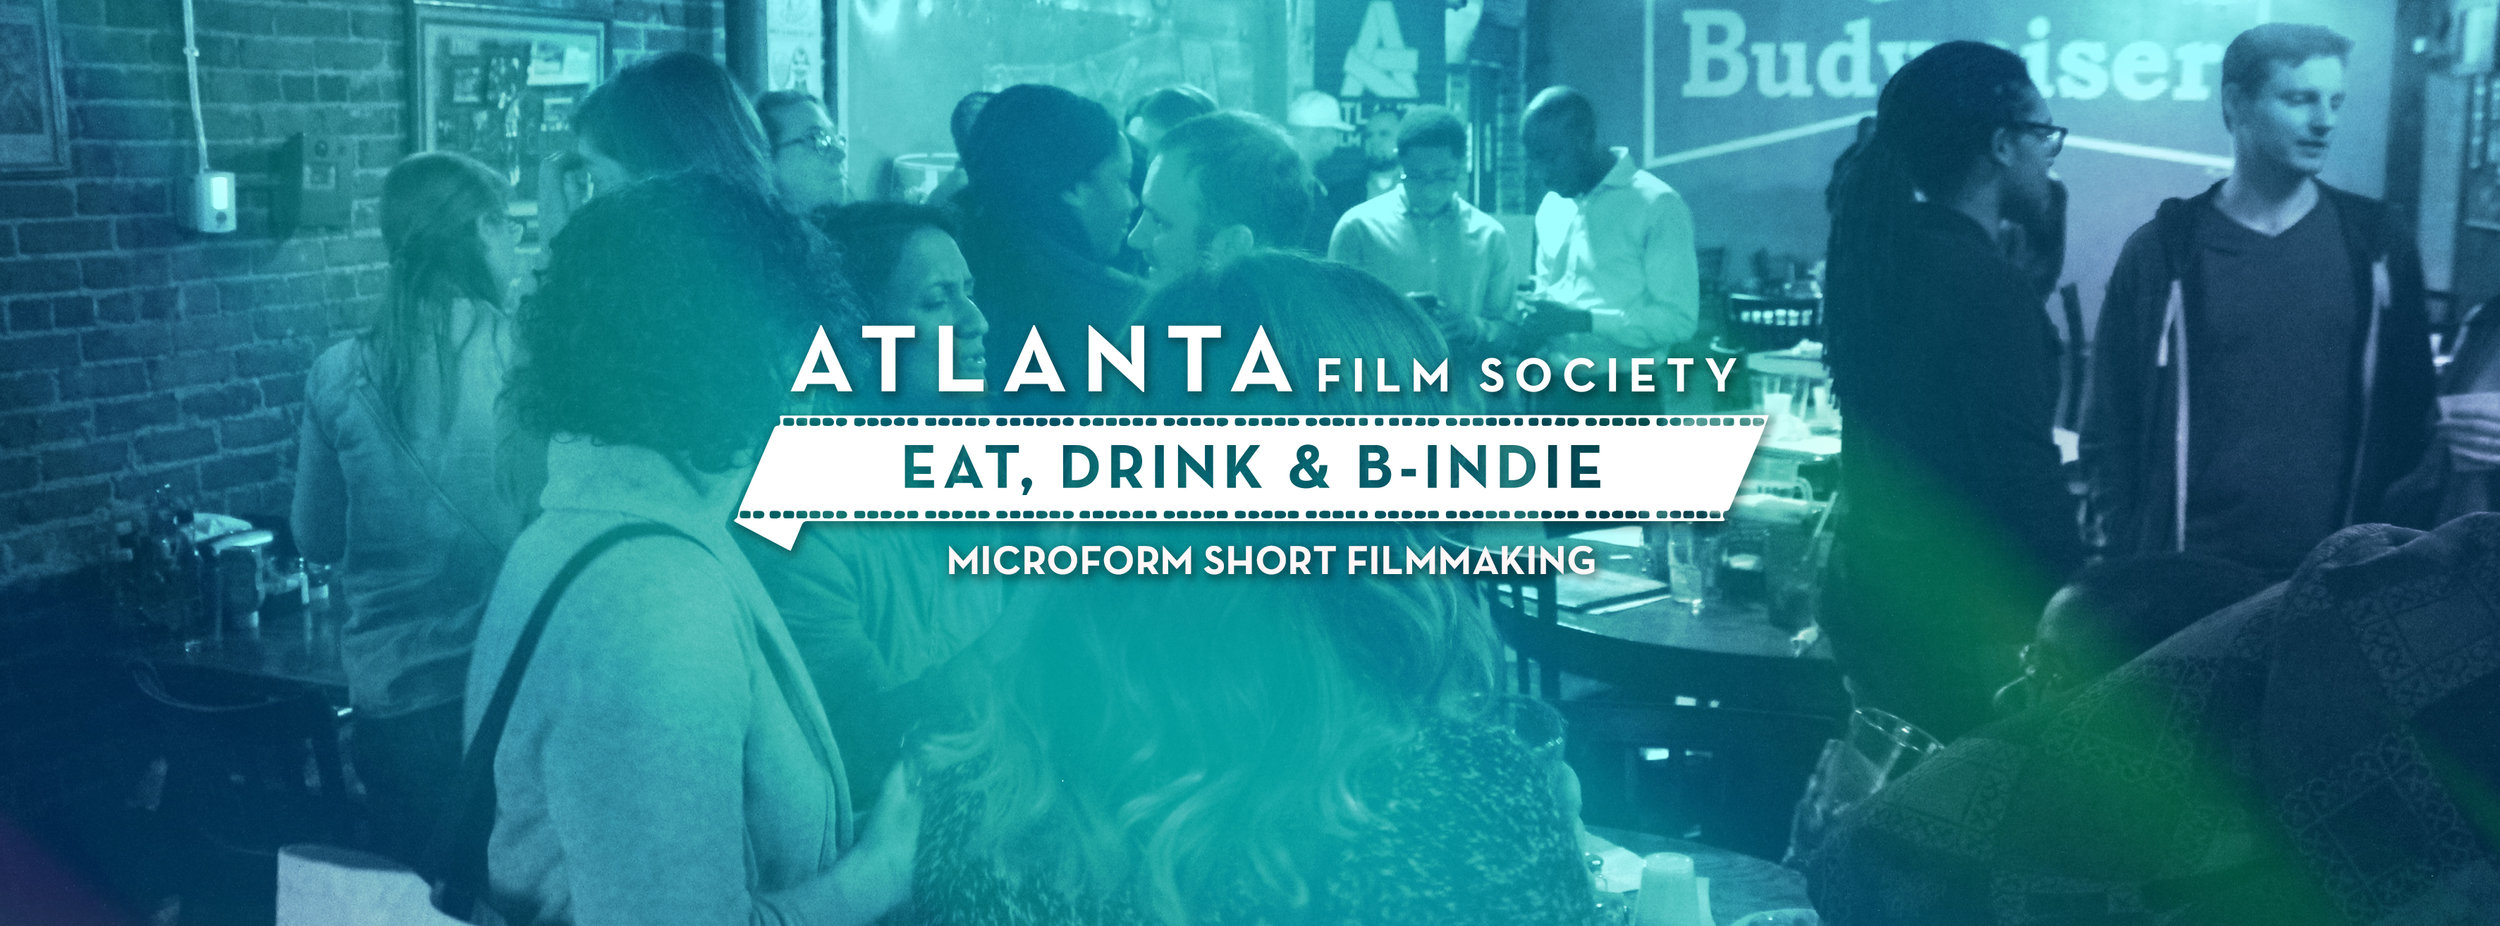 EDBI Banner_NOVEMBER - Atlanta Film Society Education Department.jpg